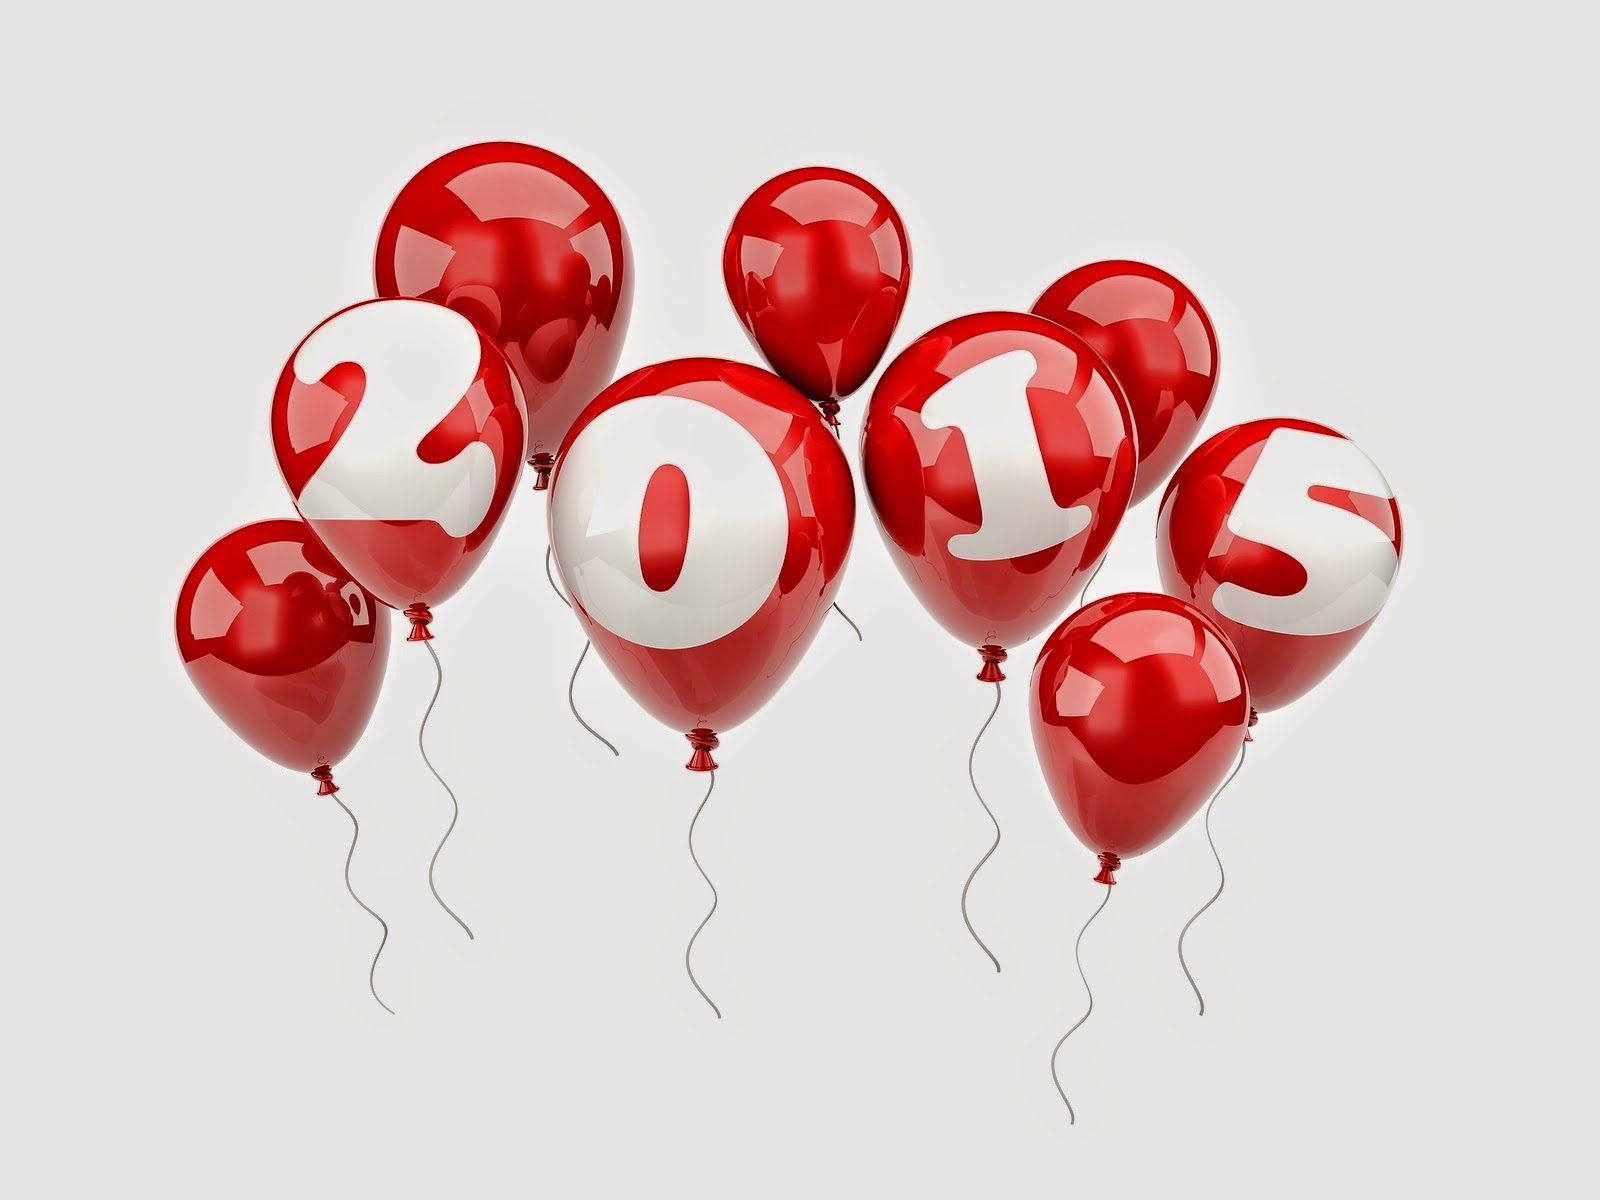 2015 Happy New Year Wallpaper